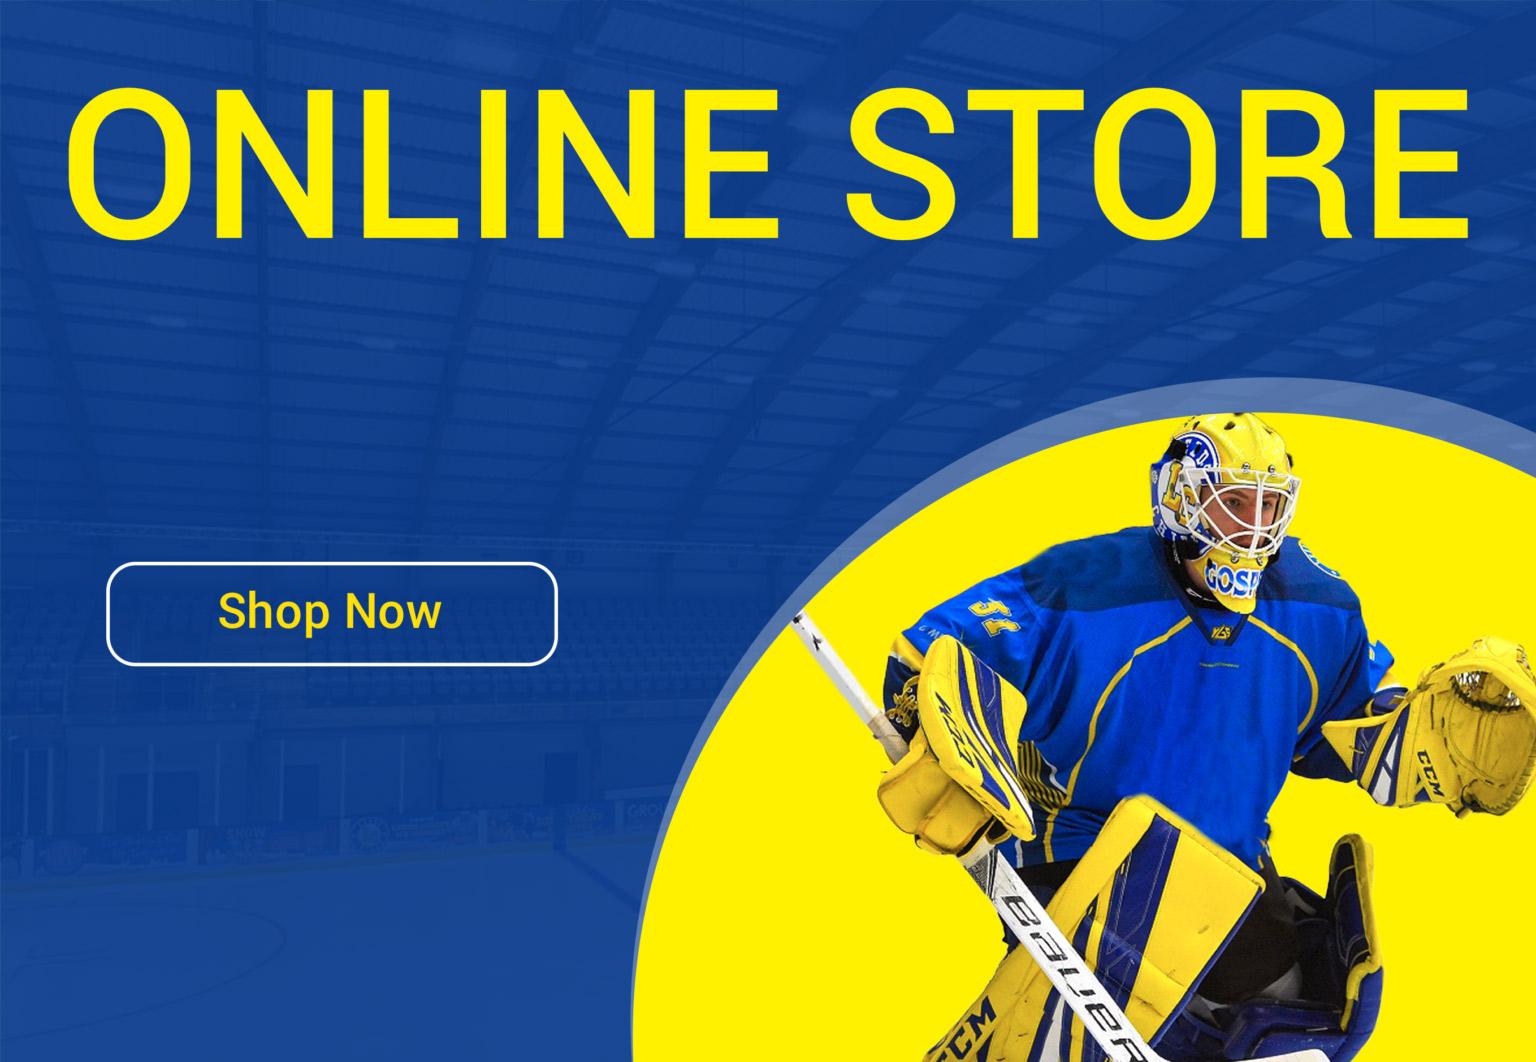 Online-store-website-artwork-no-description-1536x1062